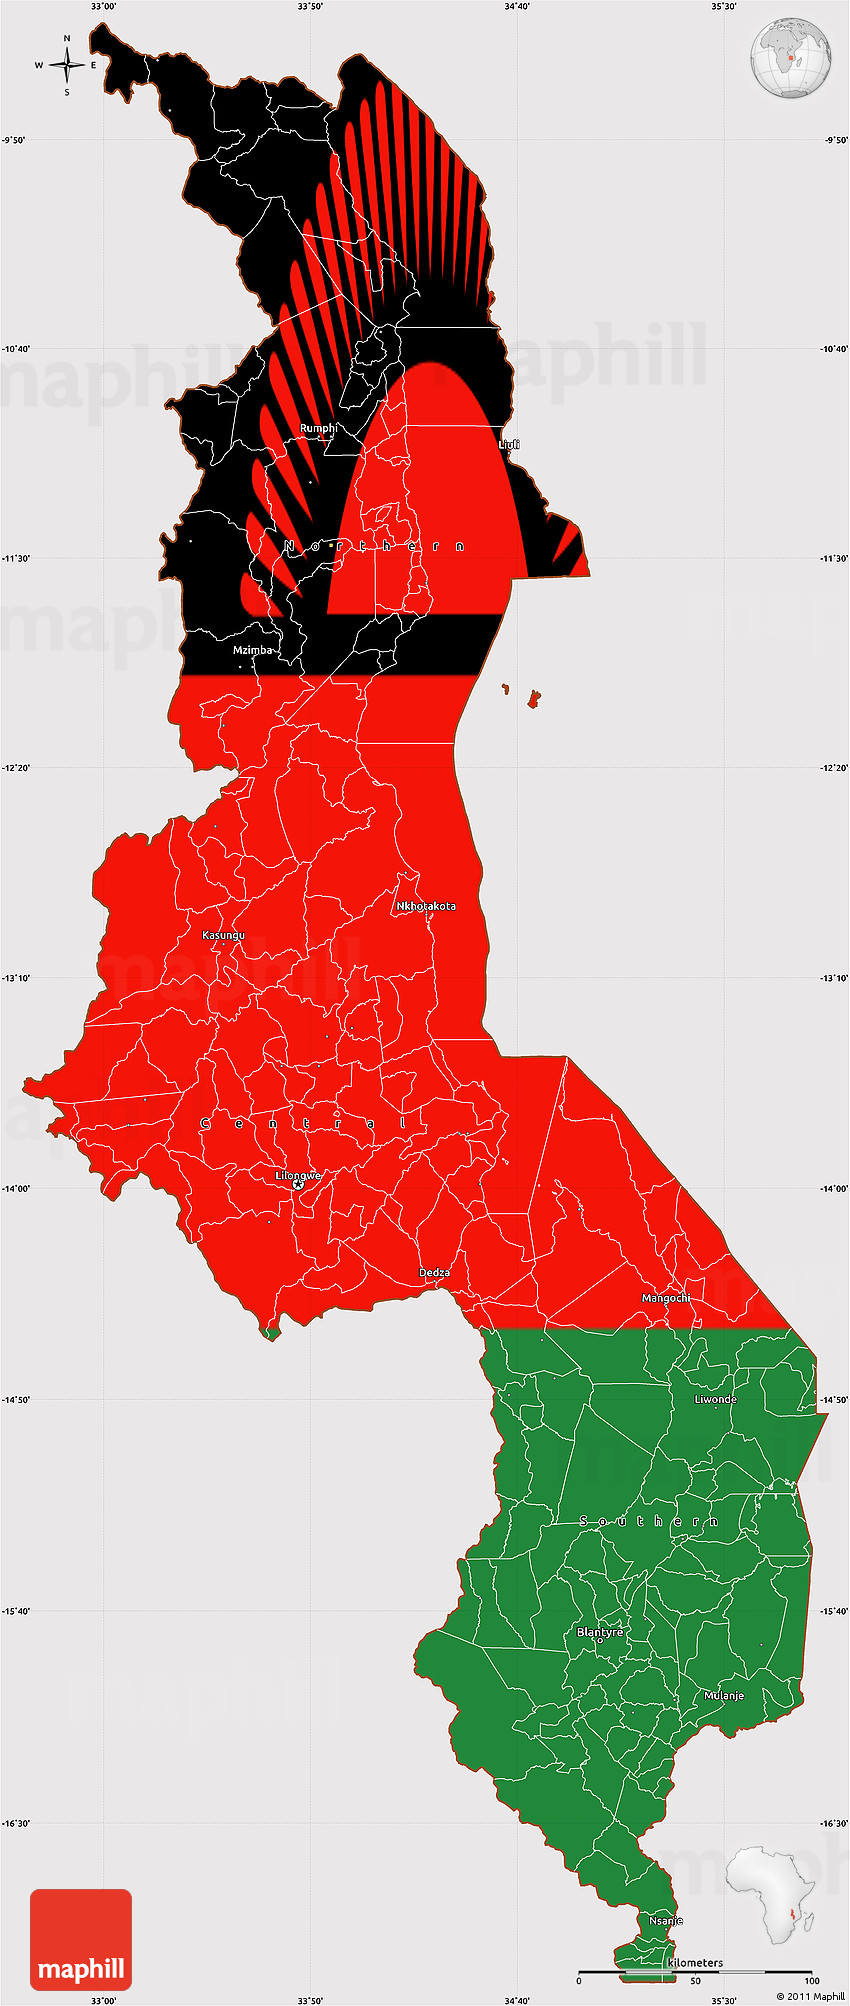 Flag Simple Map Of Malawi - Malawi blank map